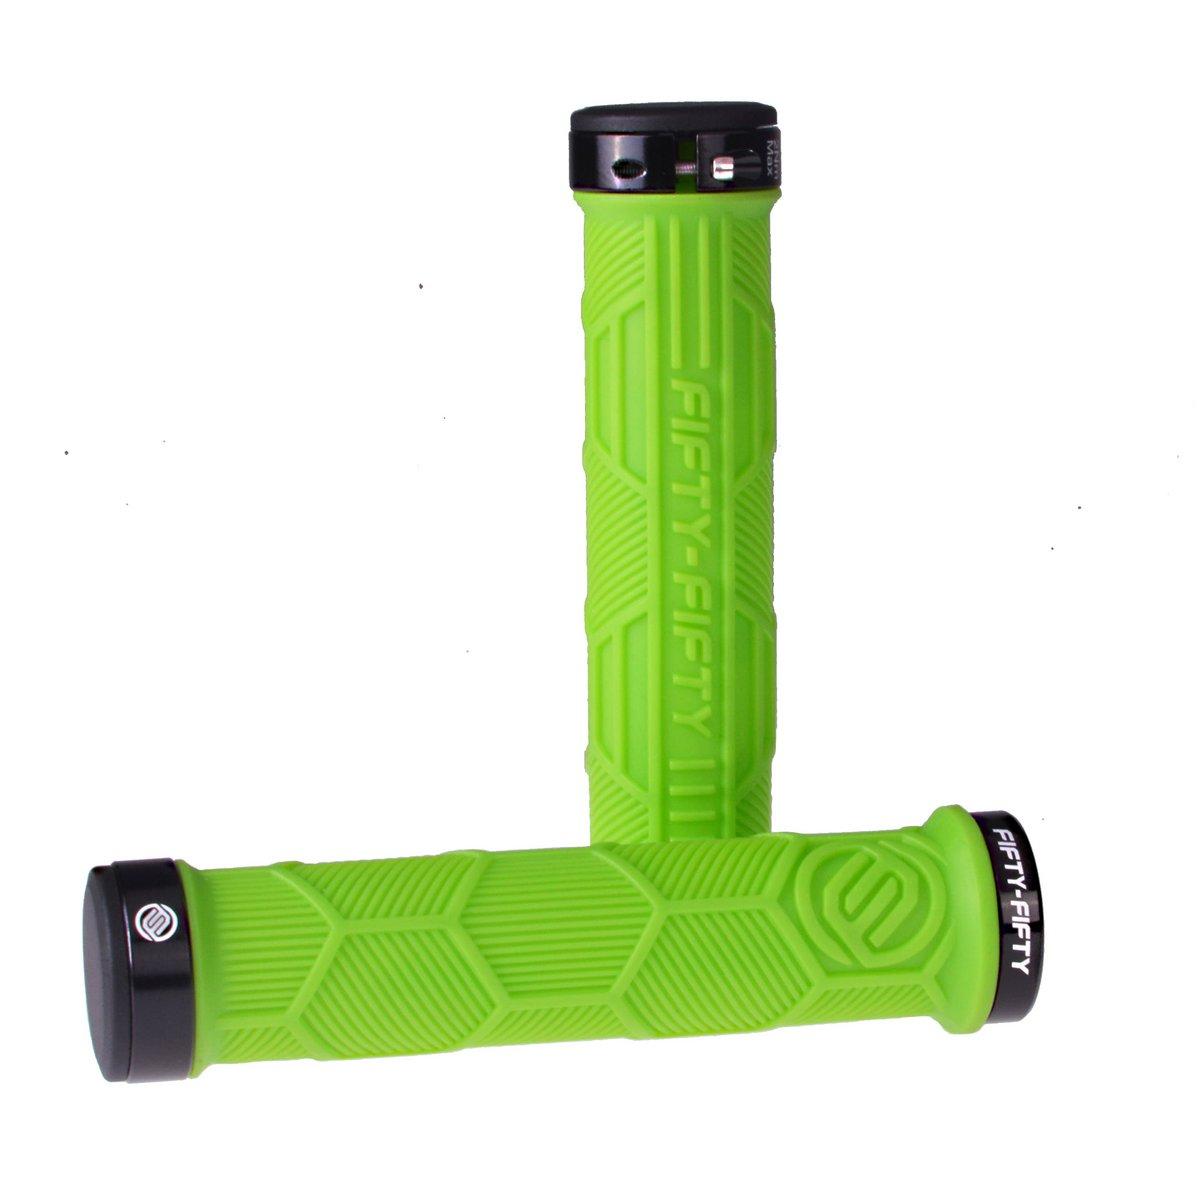 grip_green DUAL LOCK-ON GRIPS